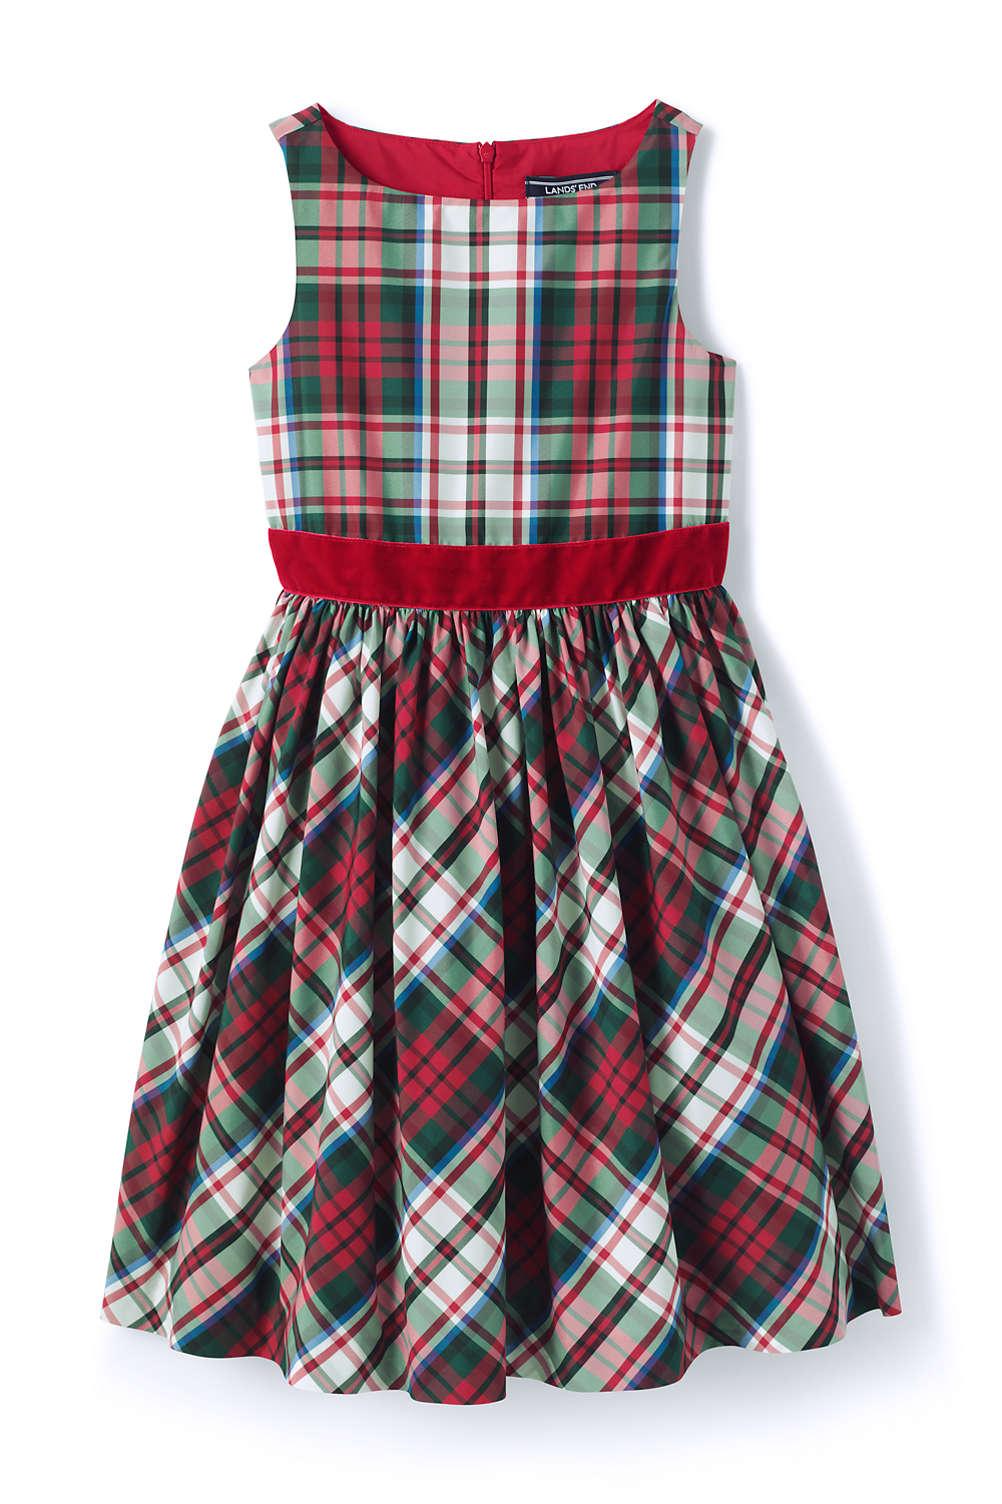 62c54f8ecedf Girls Taffeta Christmas Dress from Lands' End